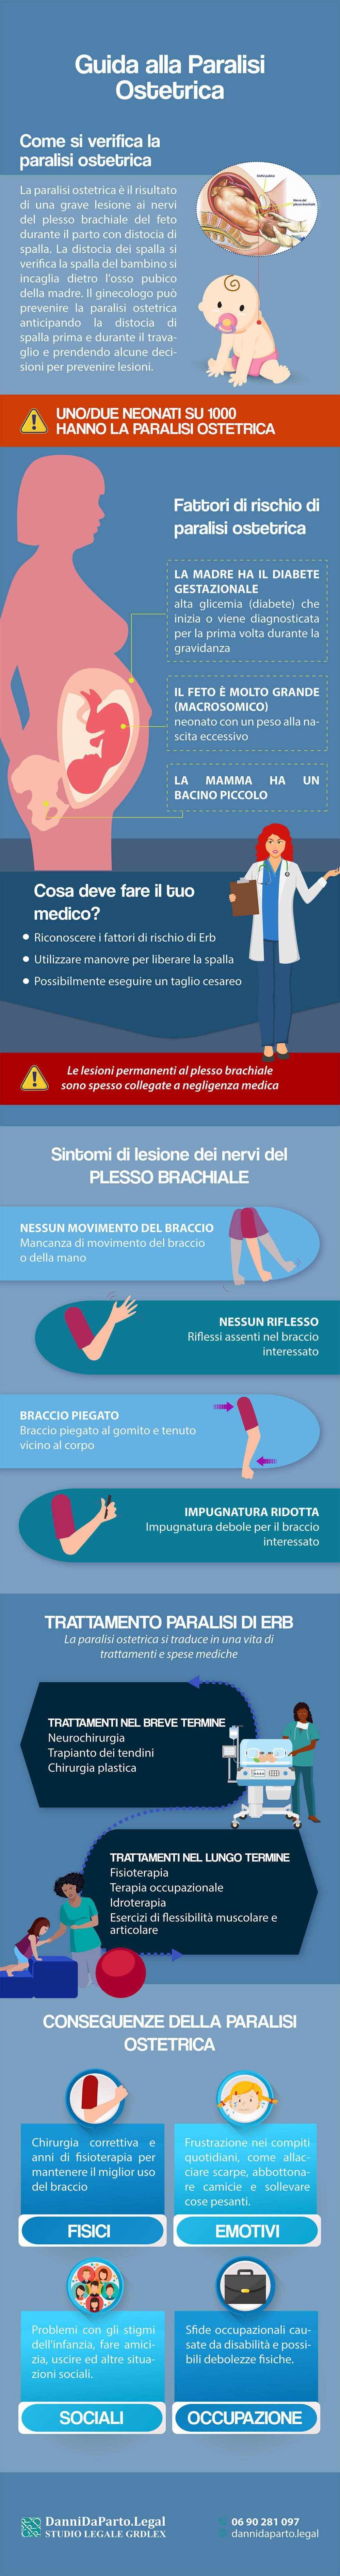 paralisi-ostetrica-infografica